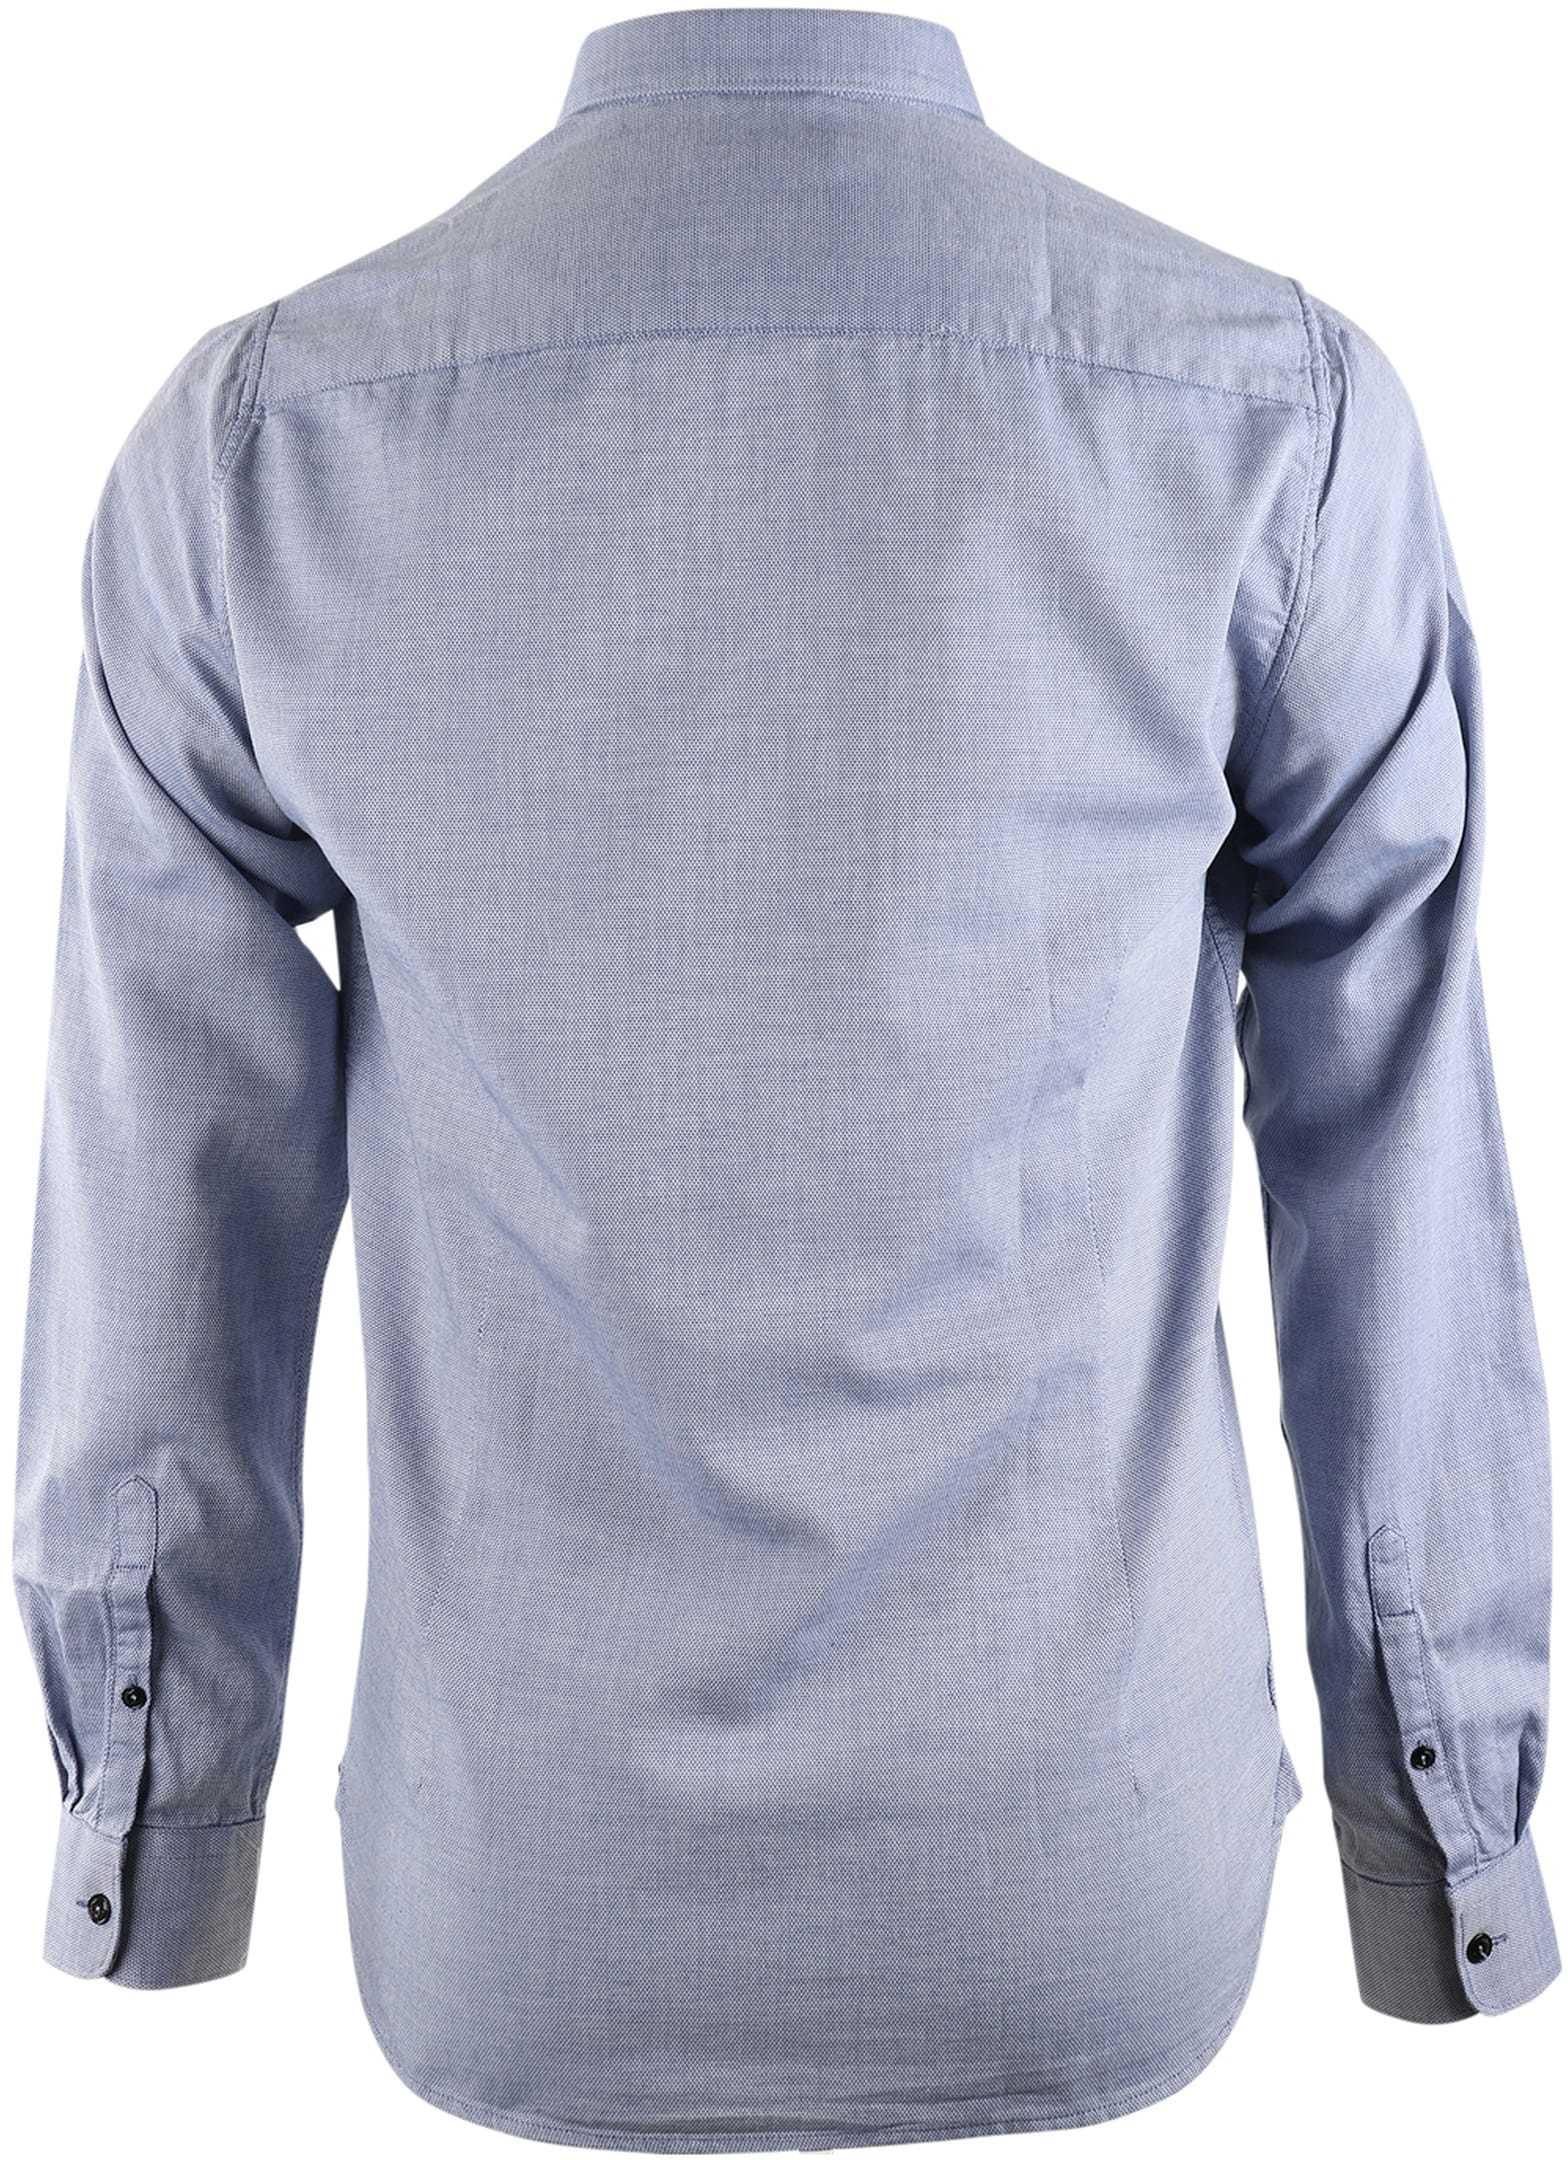 Dstrezzed Overhemd Blauw foto 1